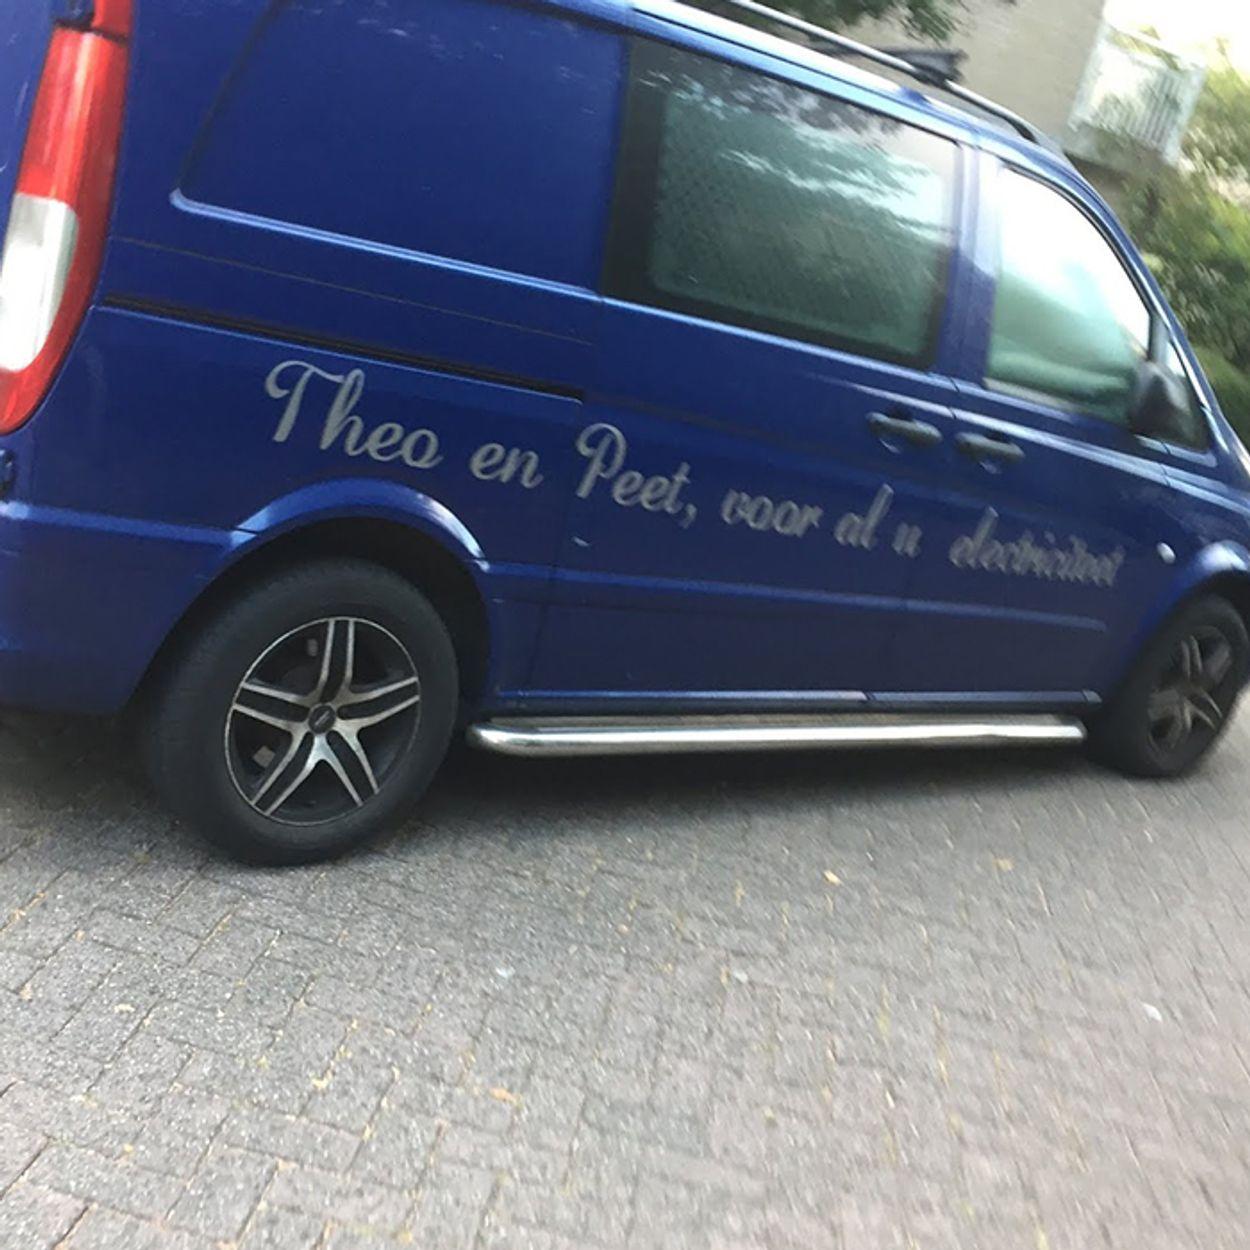 Theo en Peet, voor al u electriciteet - PC van der Peet